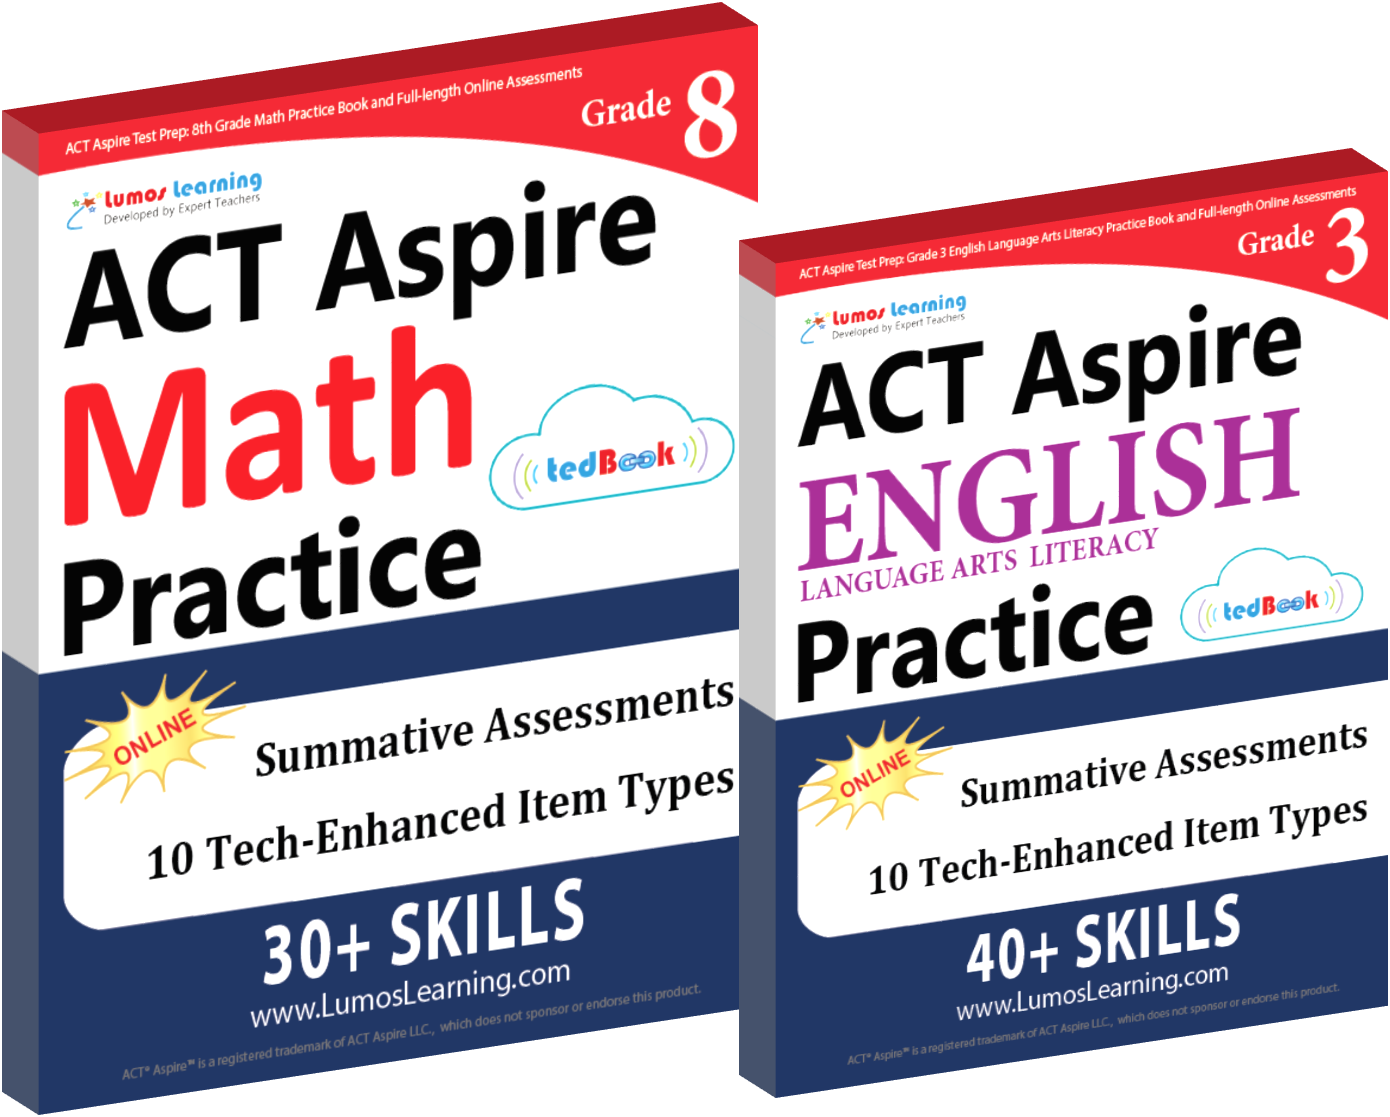 ACT Aspire practice test online workbook